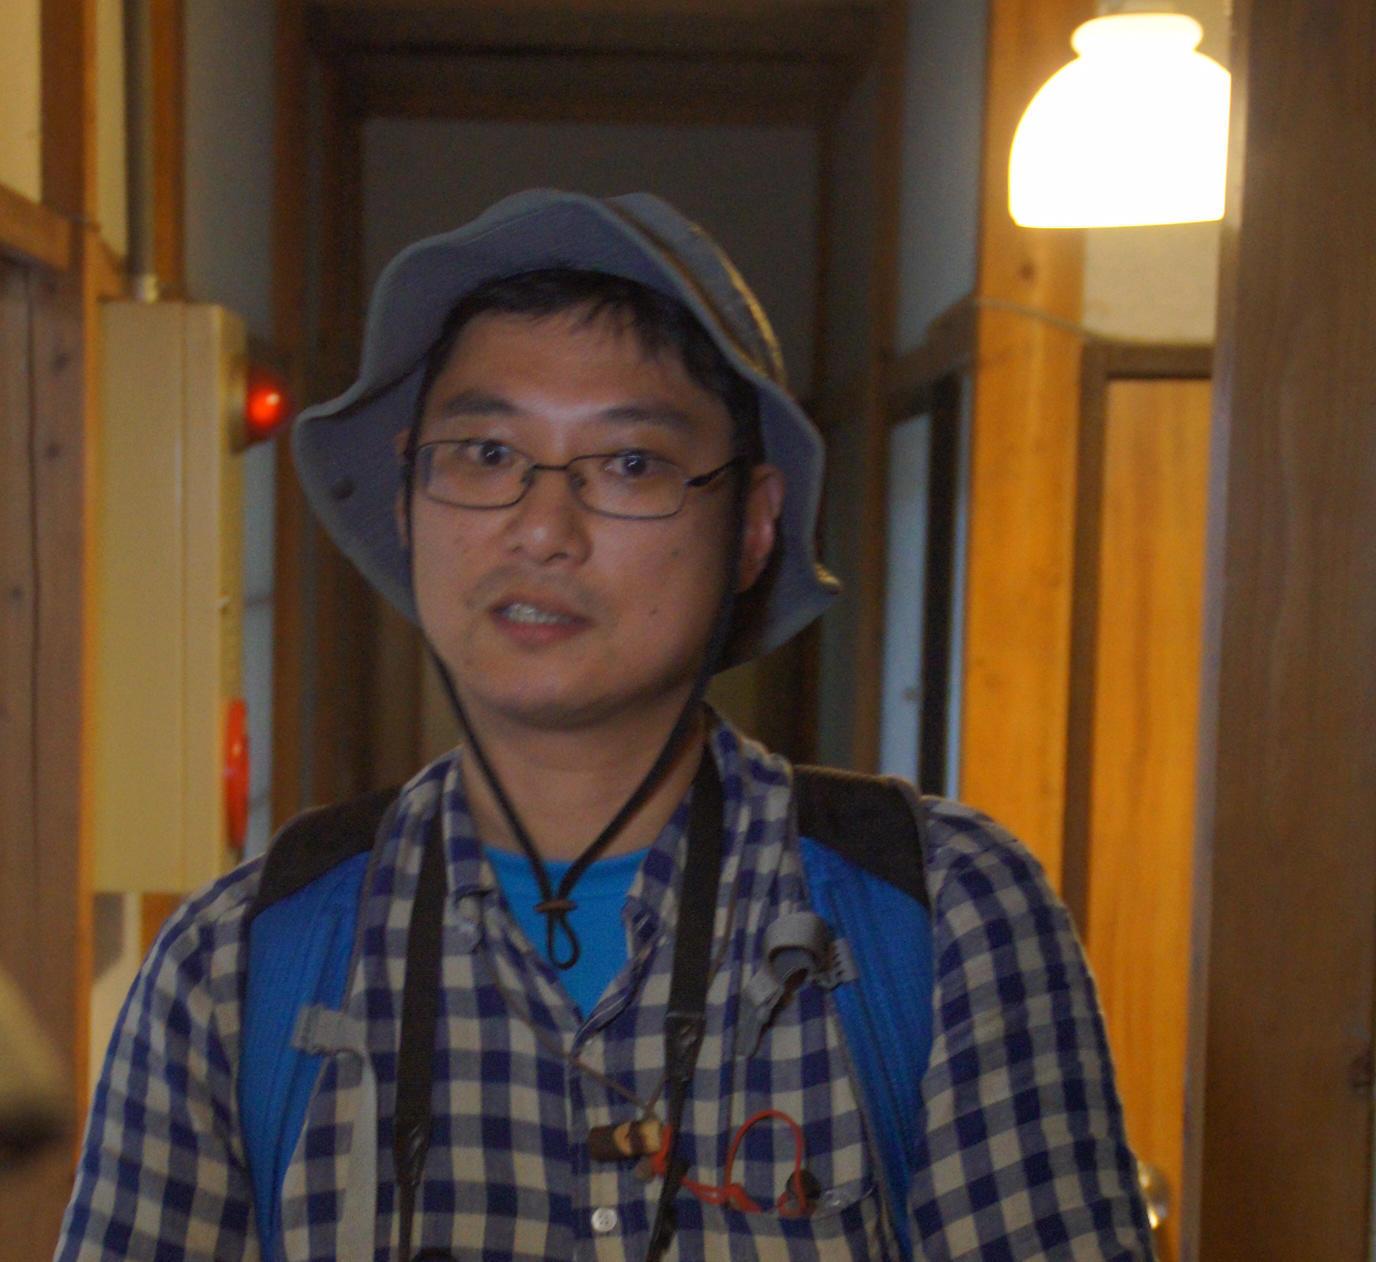 http://news.yoshimoto.co.jp/20160929161836-92dda09e37cae2b84280036dacd7303174ec22ff.jpg